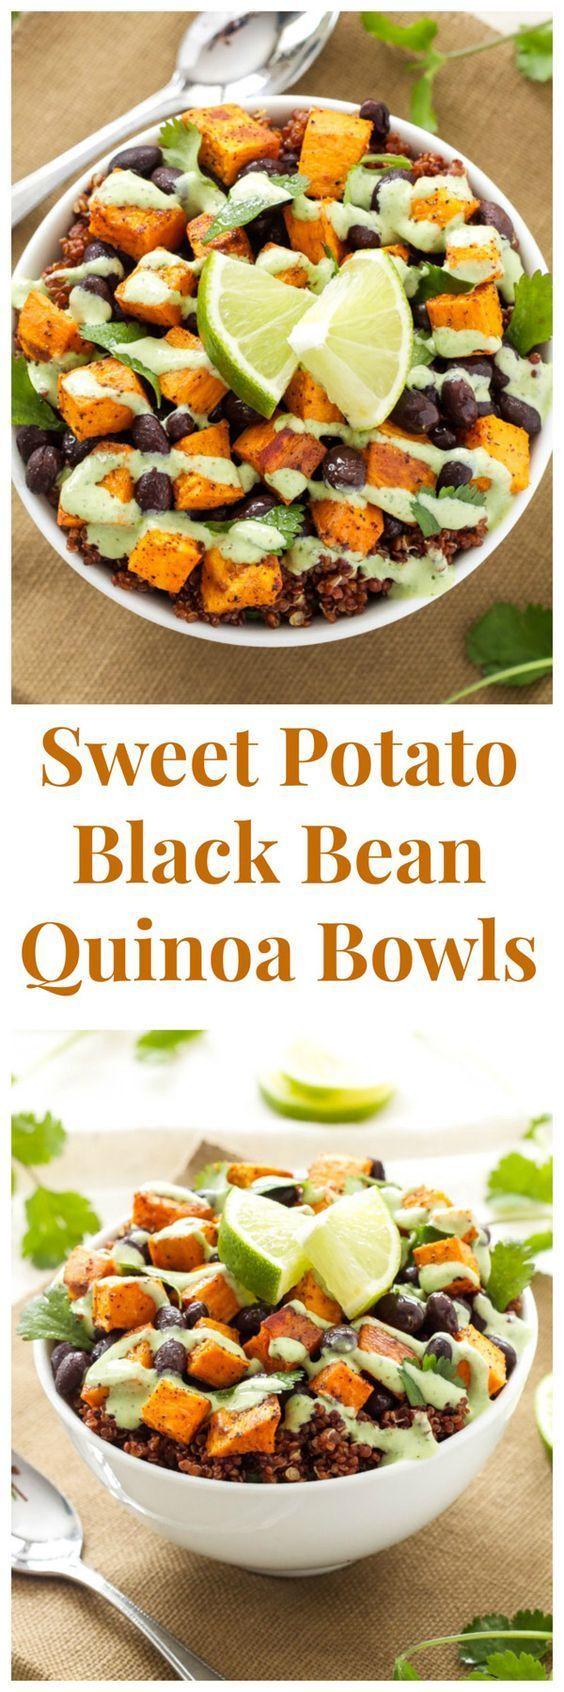 Sweet Potato and Black Bean Quinoa Bowls Sweet Potato and Black Bean Quinoa Bowls | A delicious, fi